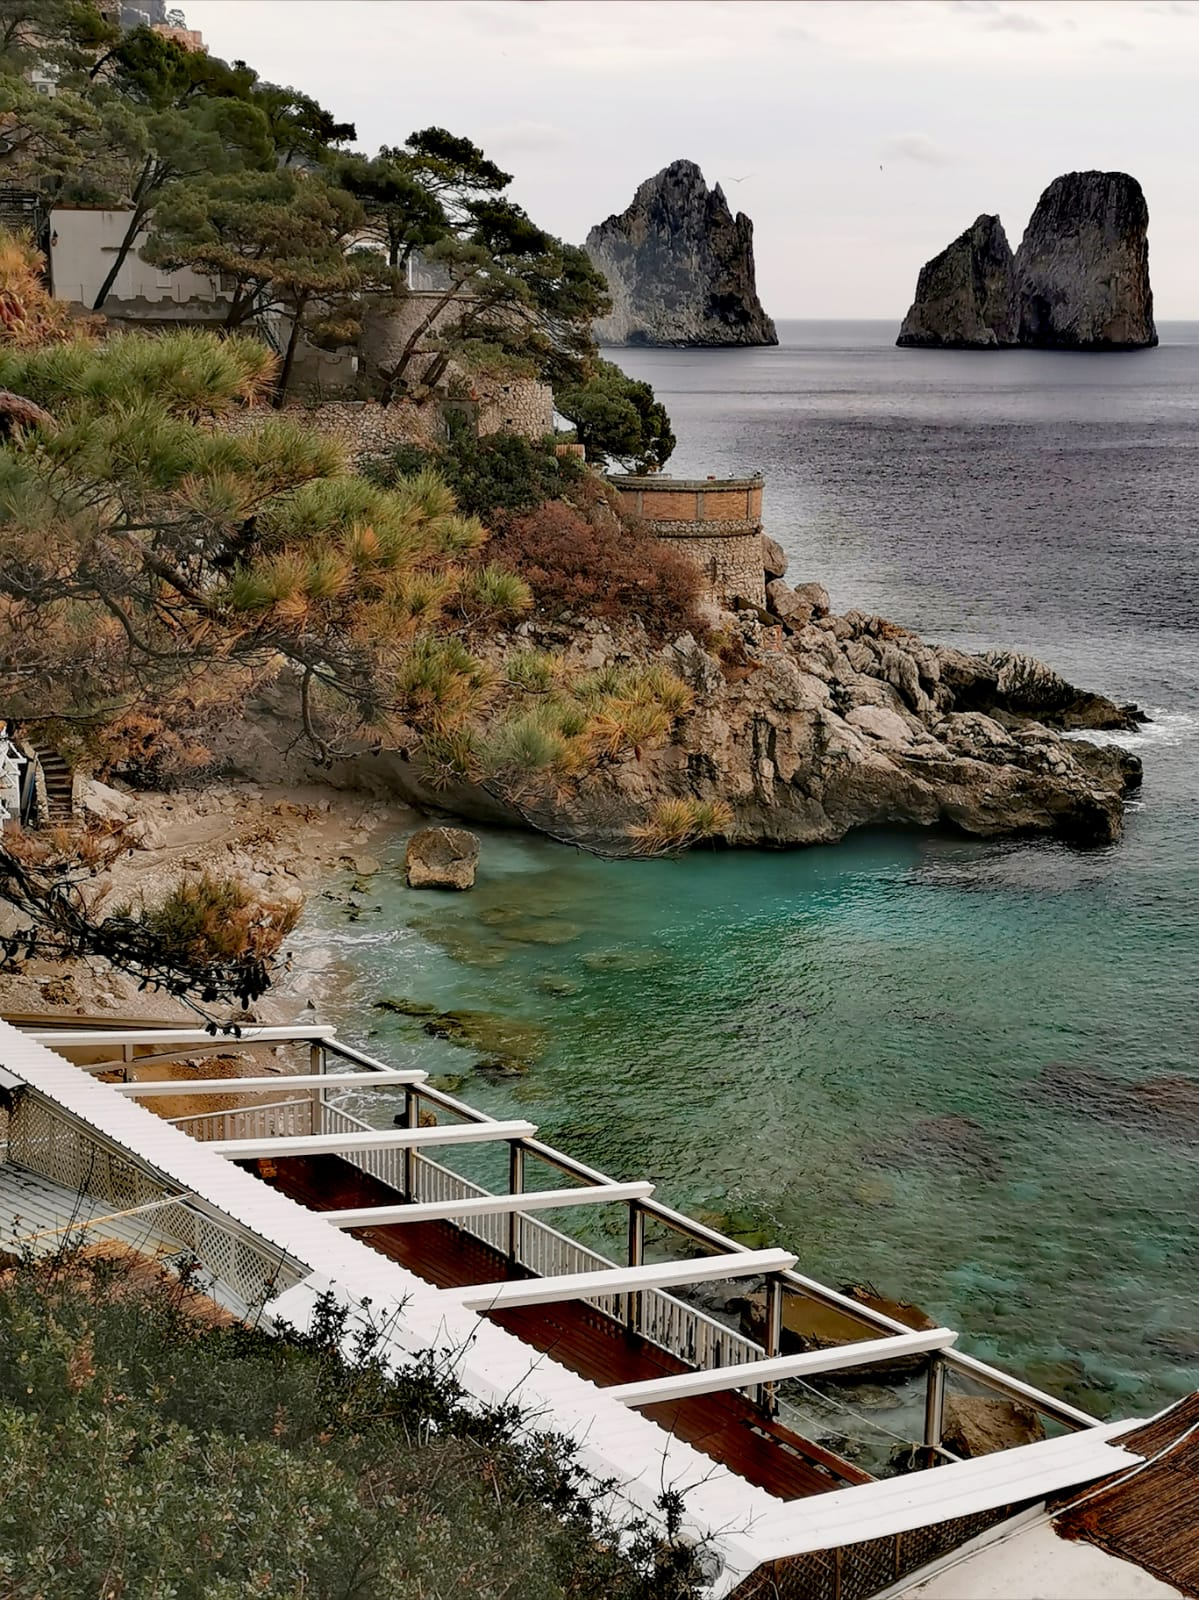 Capri in Inverno, l'affascinante Torre Saracena, la Foto é un Quadro